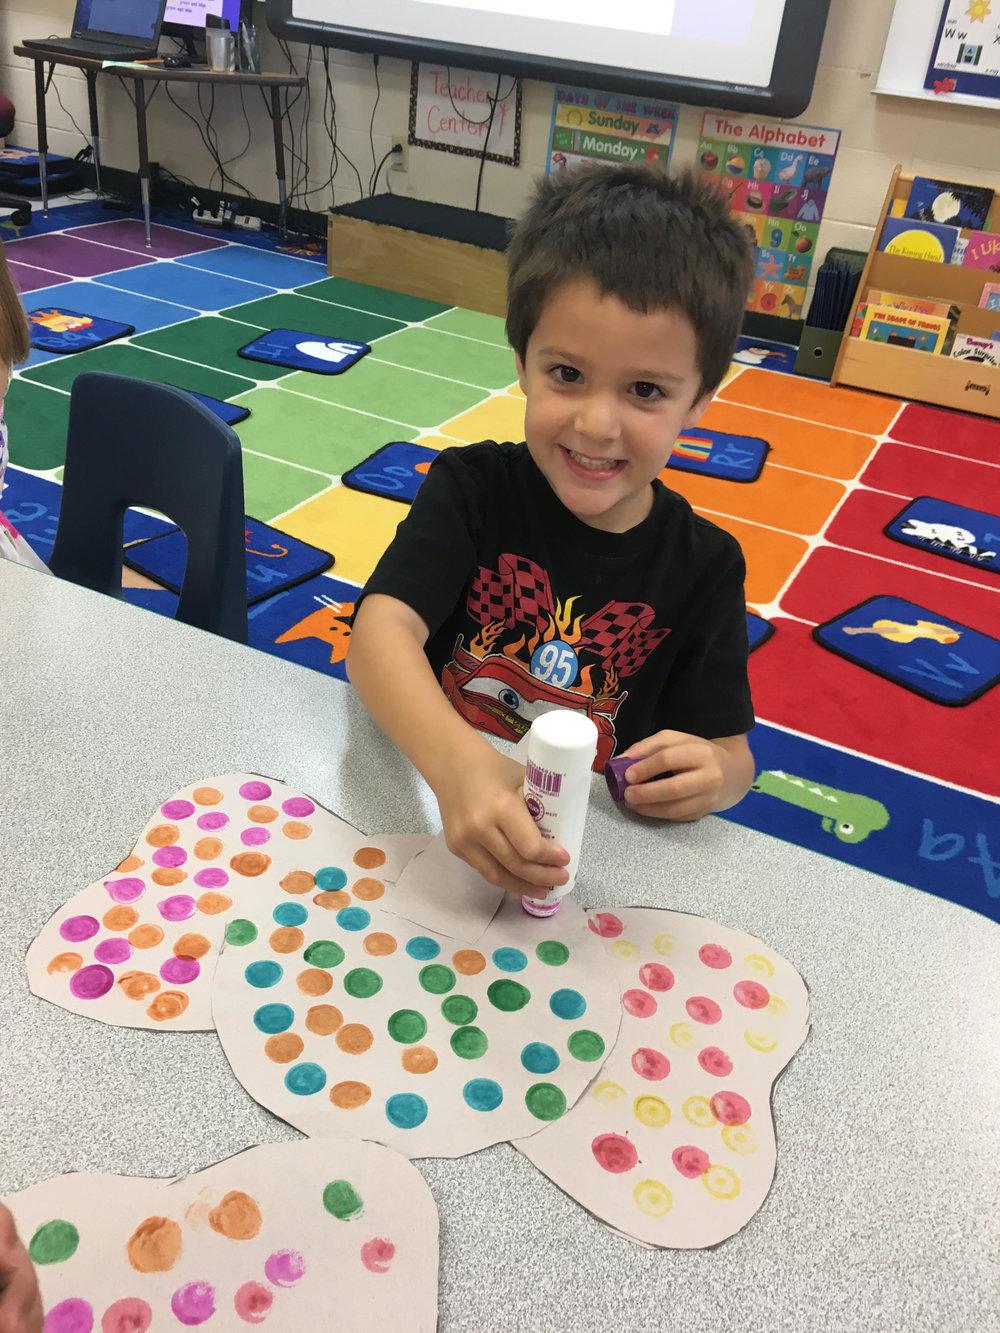 using bingo dobbers to make Elmer colorful